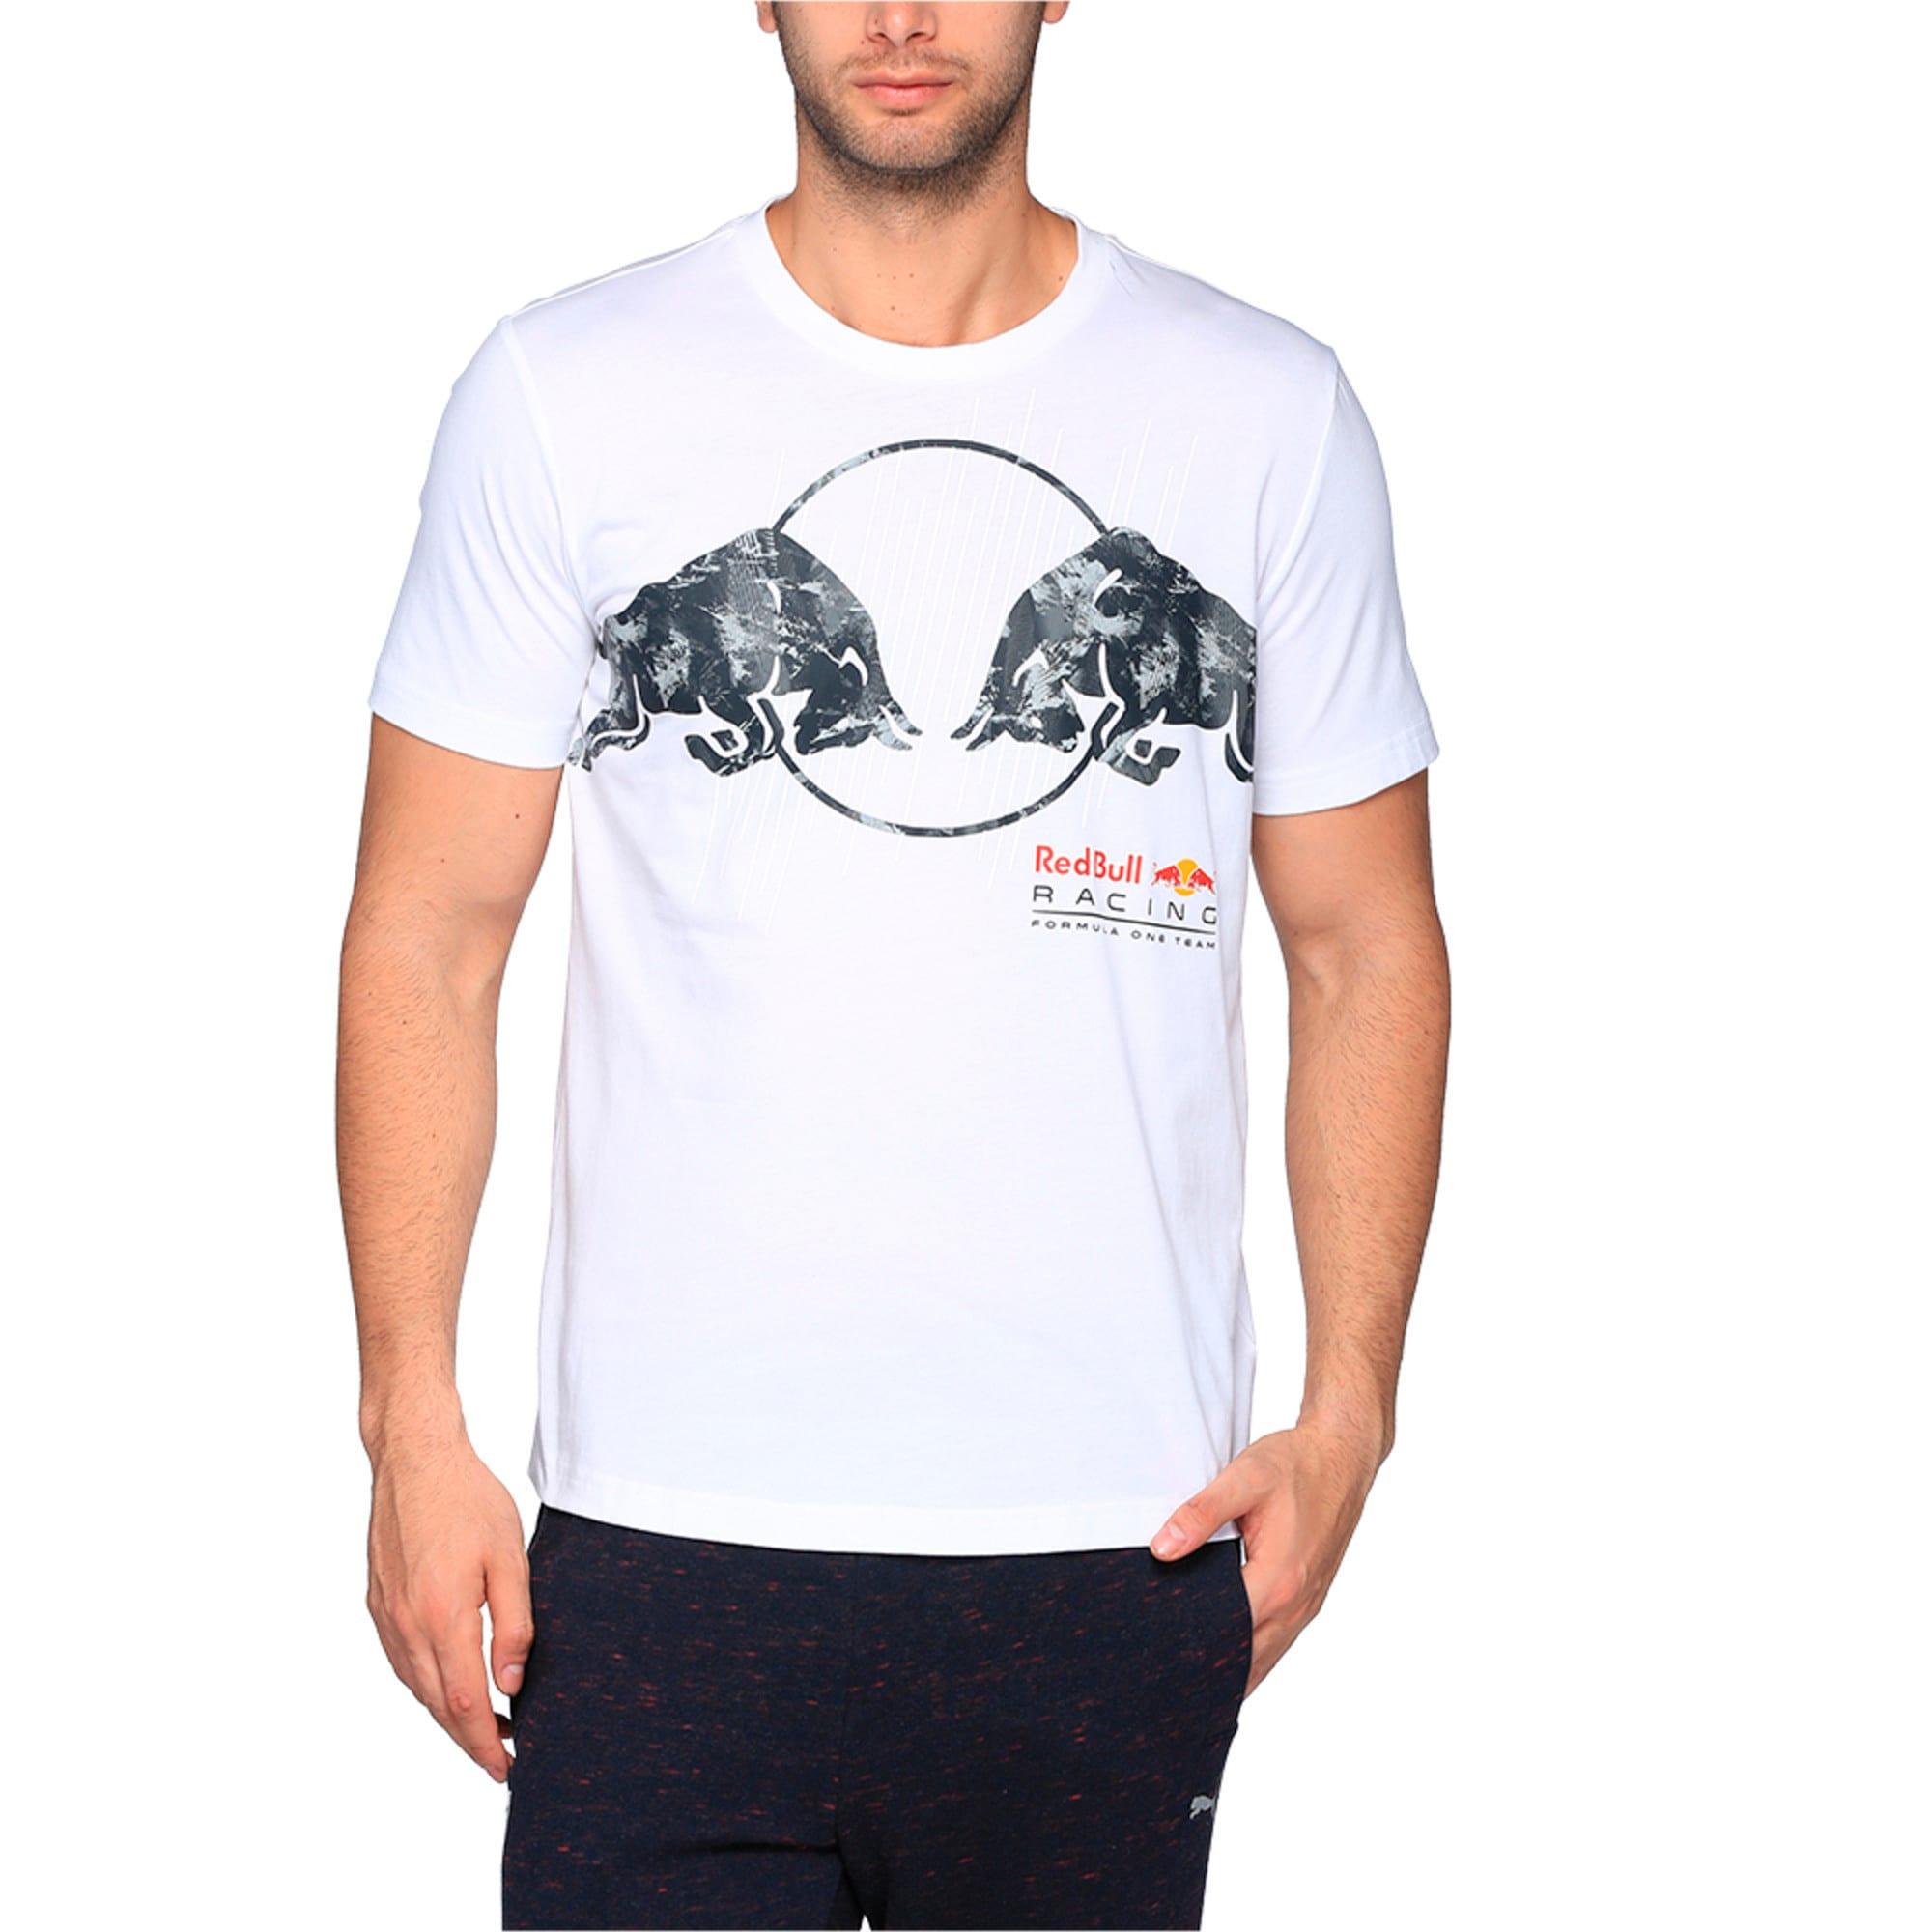 Thumbnail 1 of Red Bull Racing Men's Graphic T-Shirt, Puma White, medium-IND